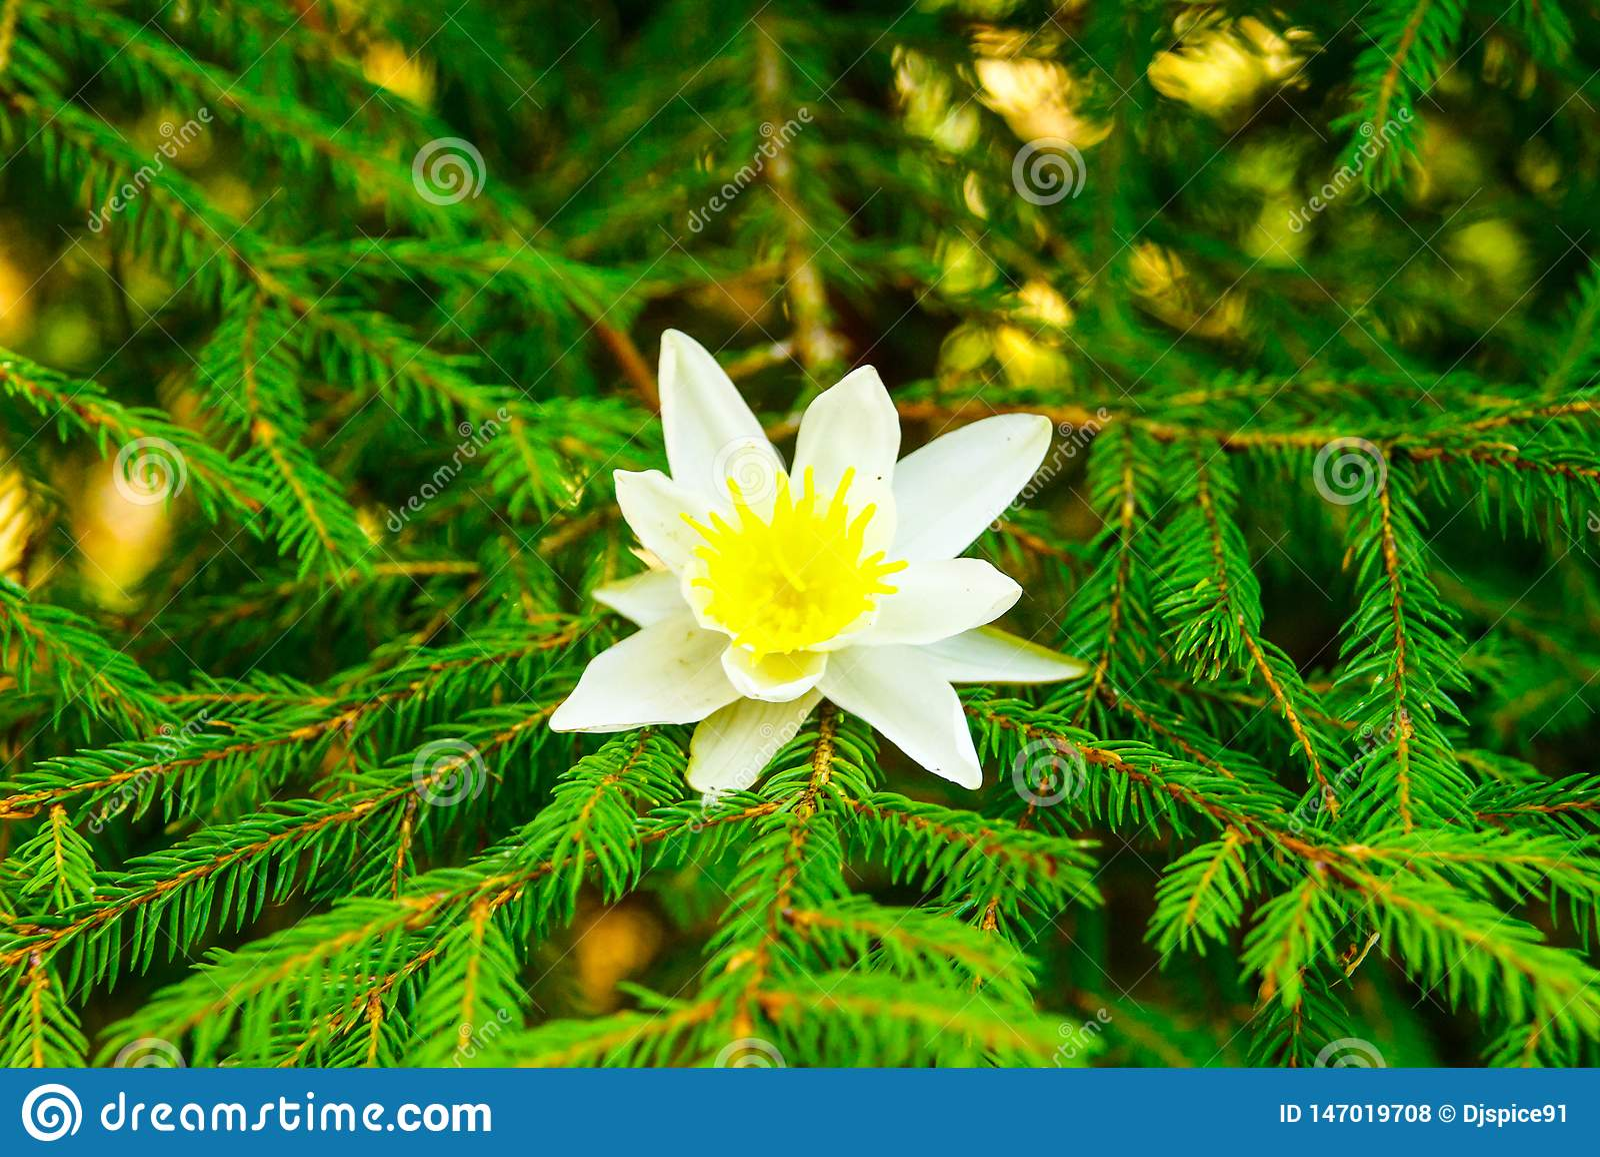 White flower on fir branch